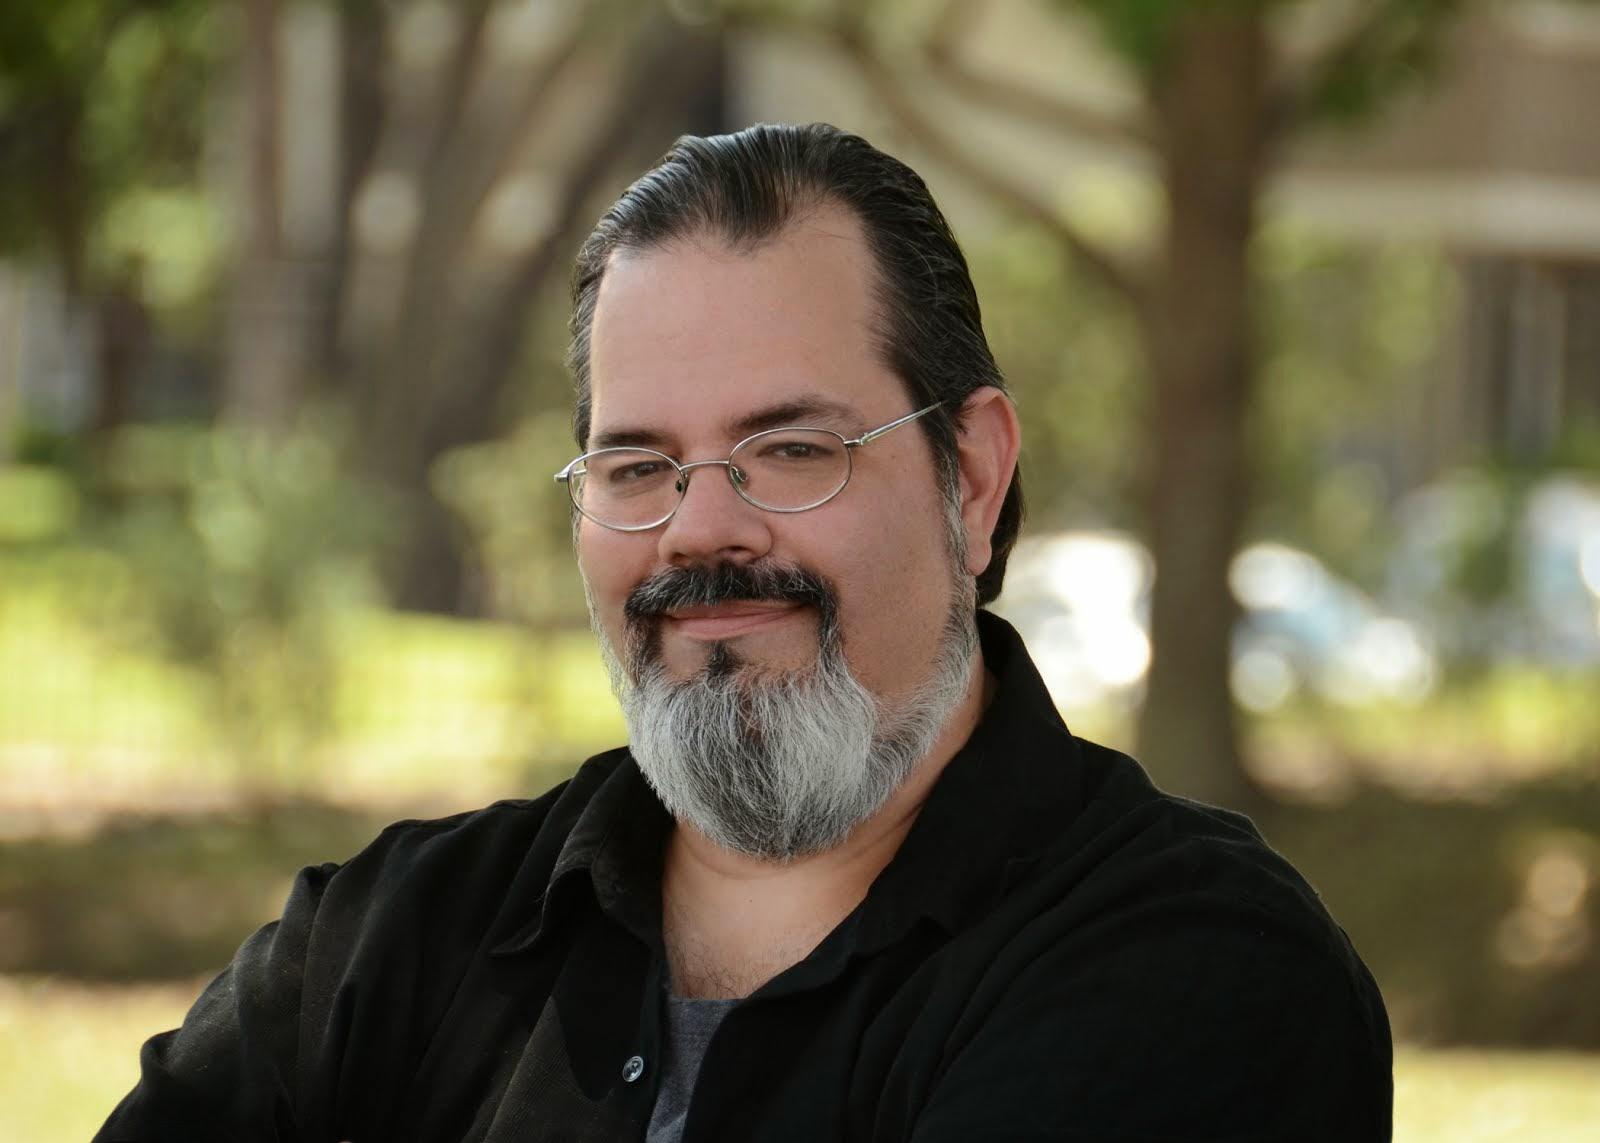 James Hazlerig, MA, Certified Hypnosis Practitioner